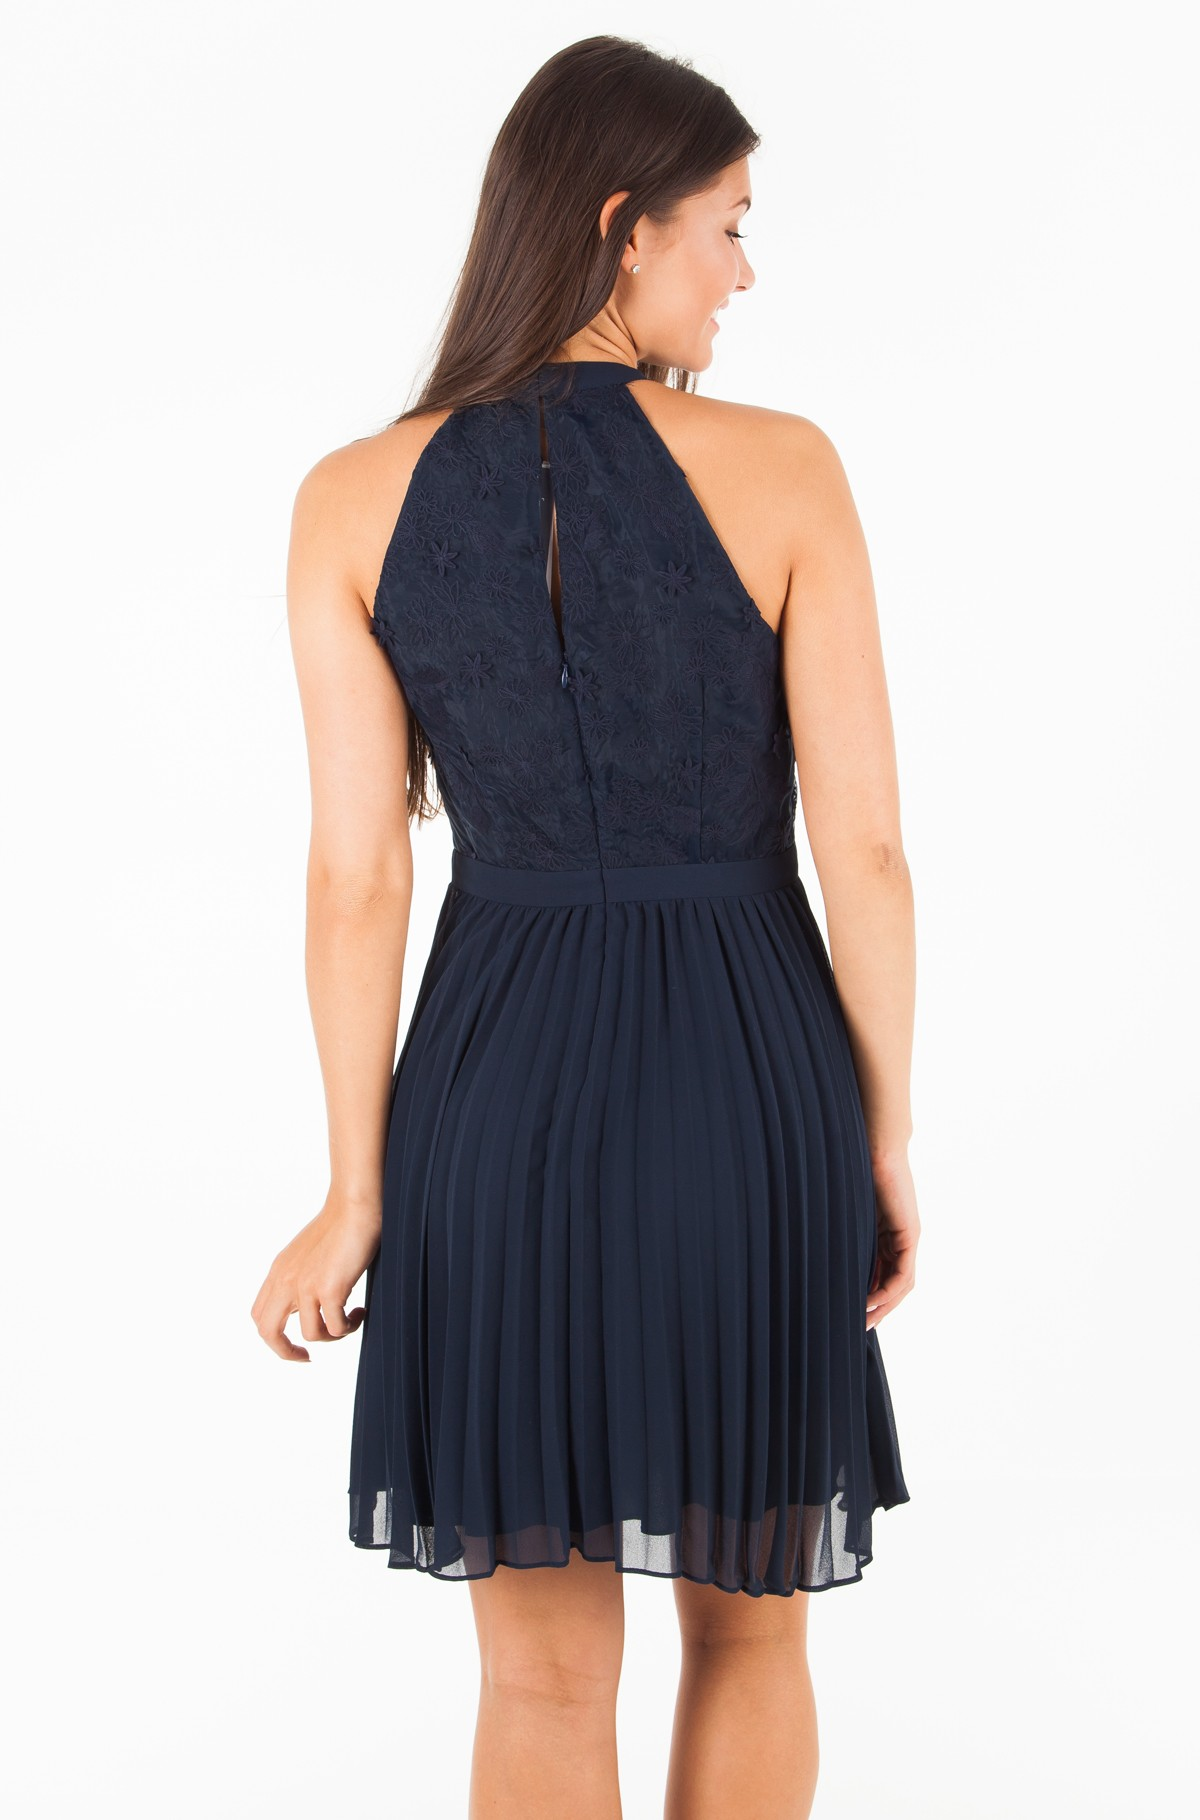 Suknelė Helfie Dress Ns-full-2